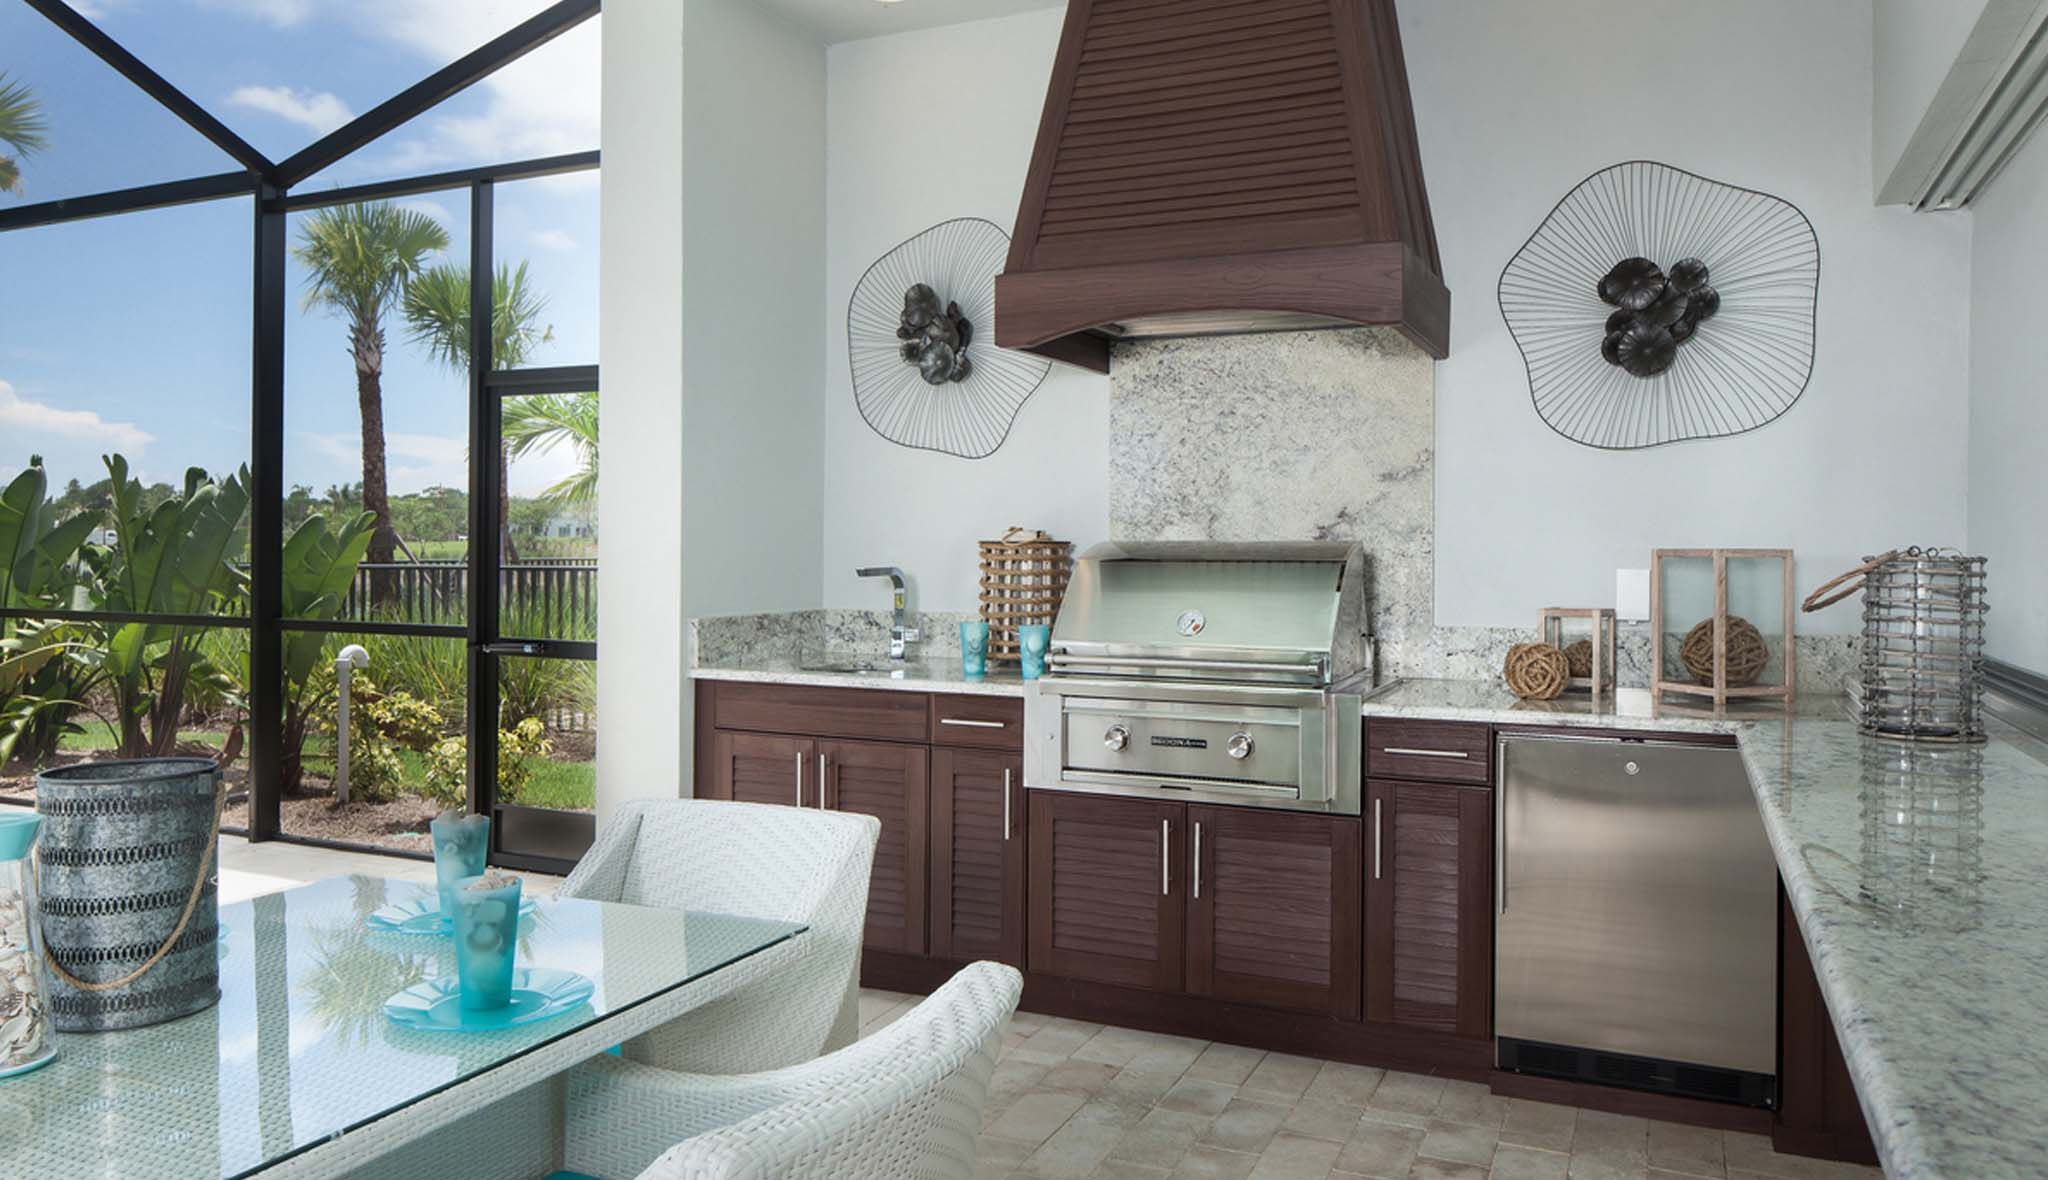 outdoor kitchen designs granite countertops kitchen outdoor kitchen design kitchen on outdoor kitchen backsplash id=45667